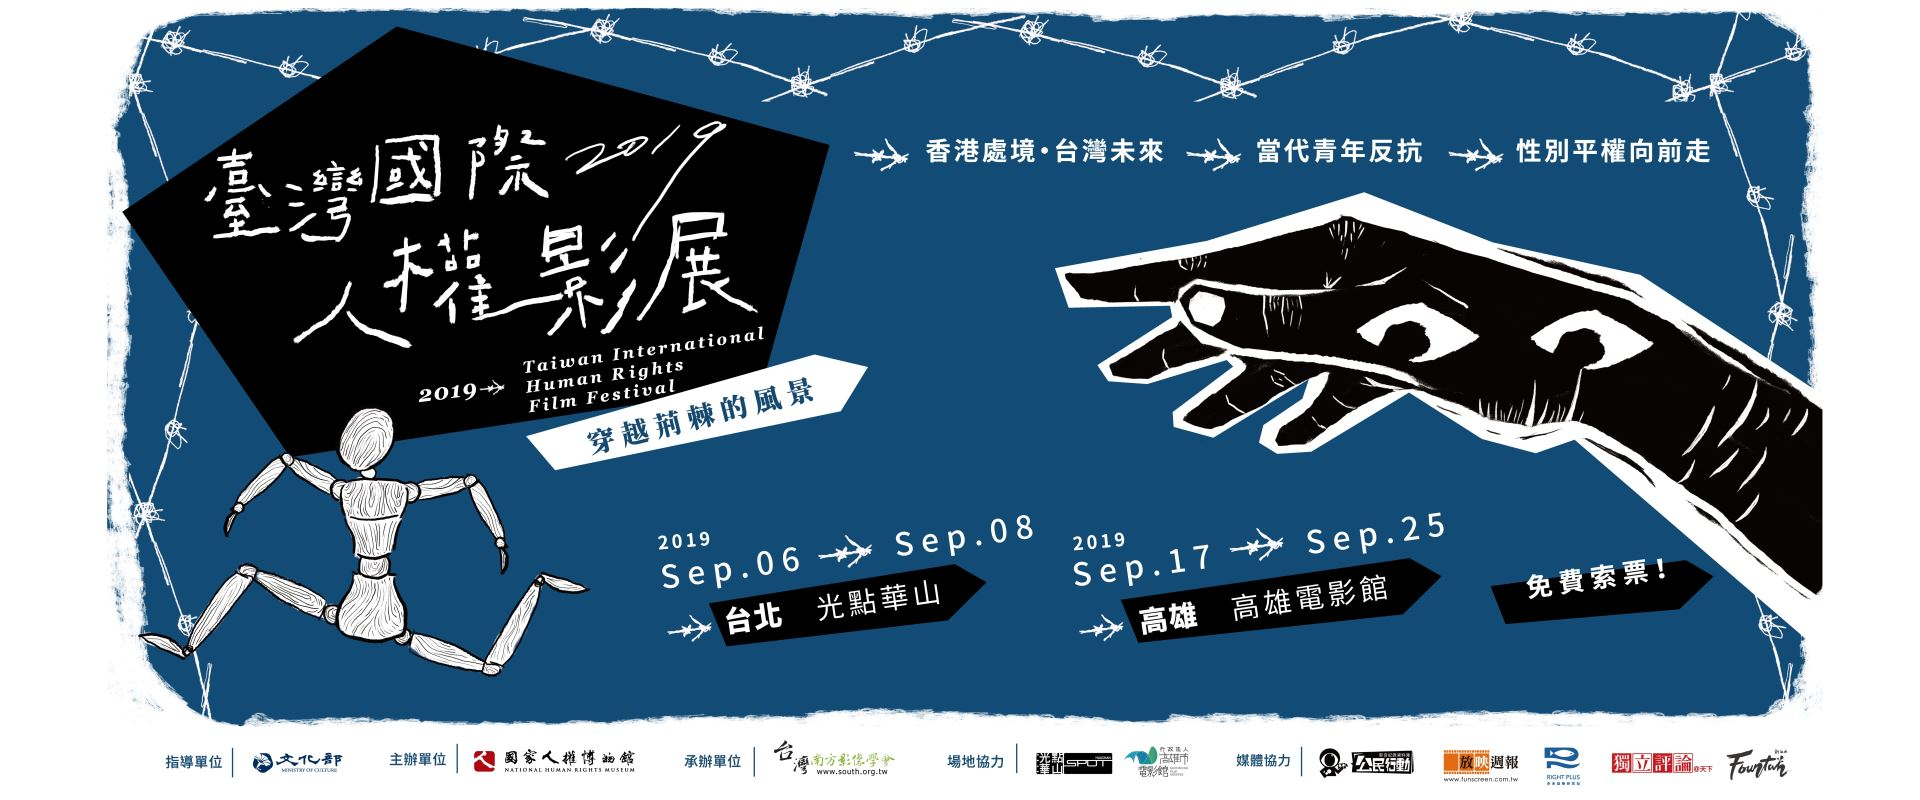 2019人権映画祭 「荊棘を超える風景」[另開新視窗]